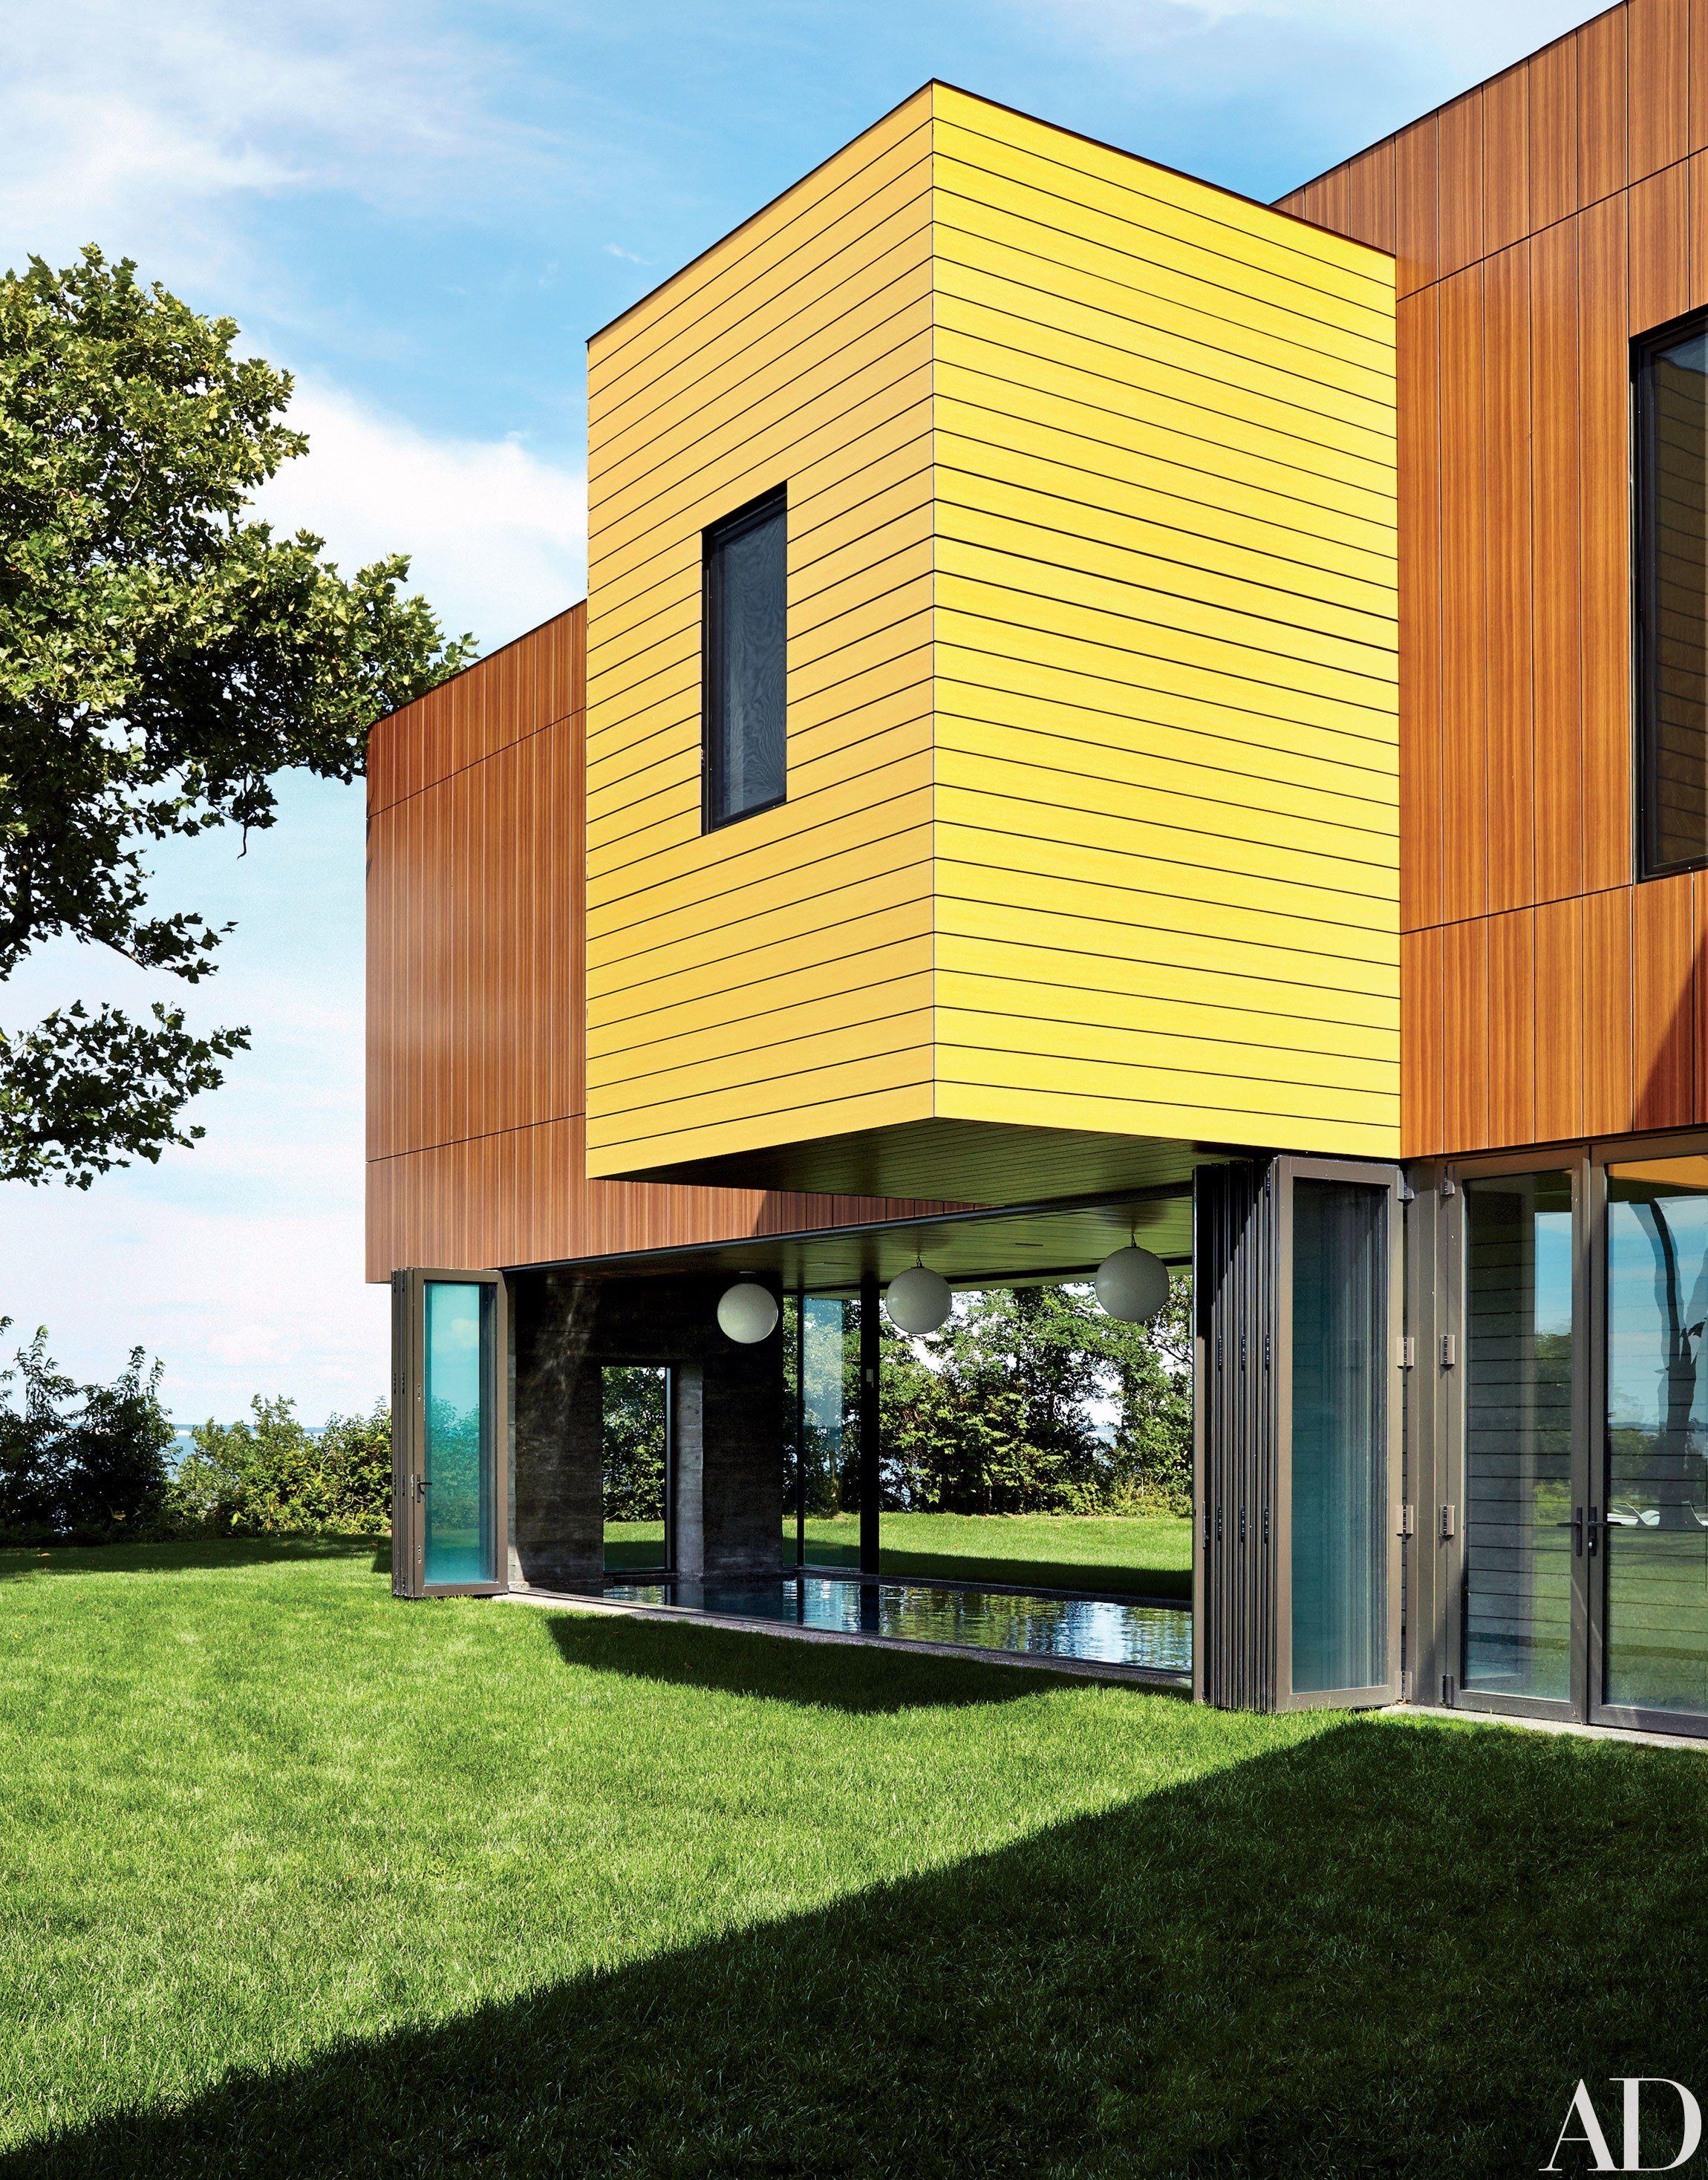 Interior Designer Muriel Brandolinis Vibrant Hamptons Beach House Photos -